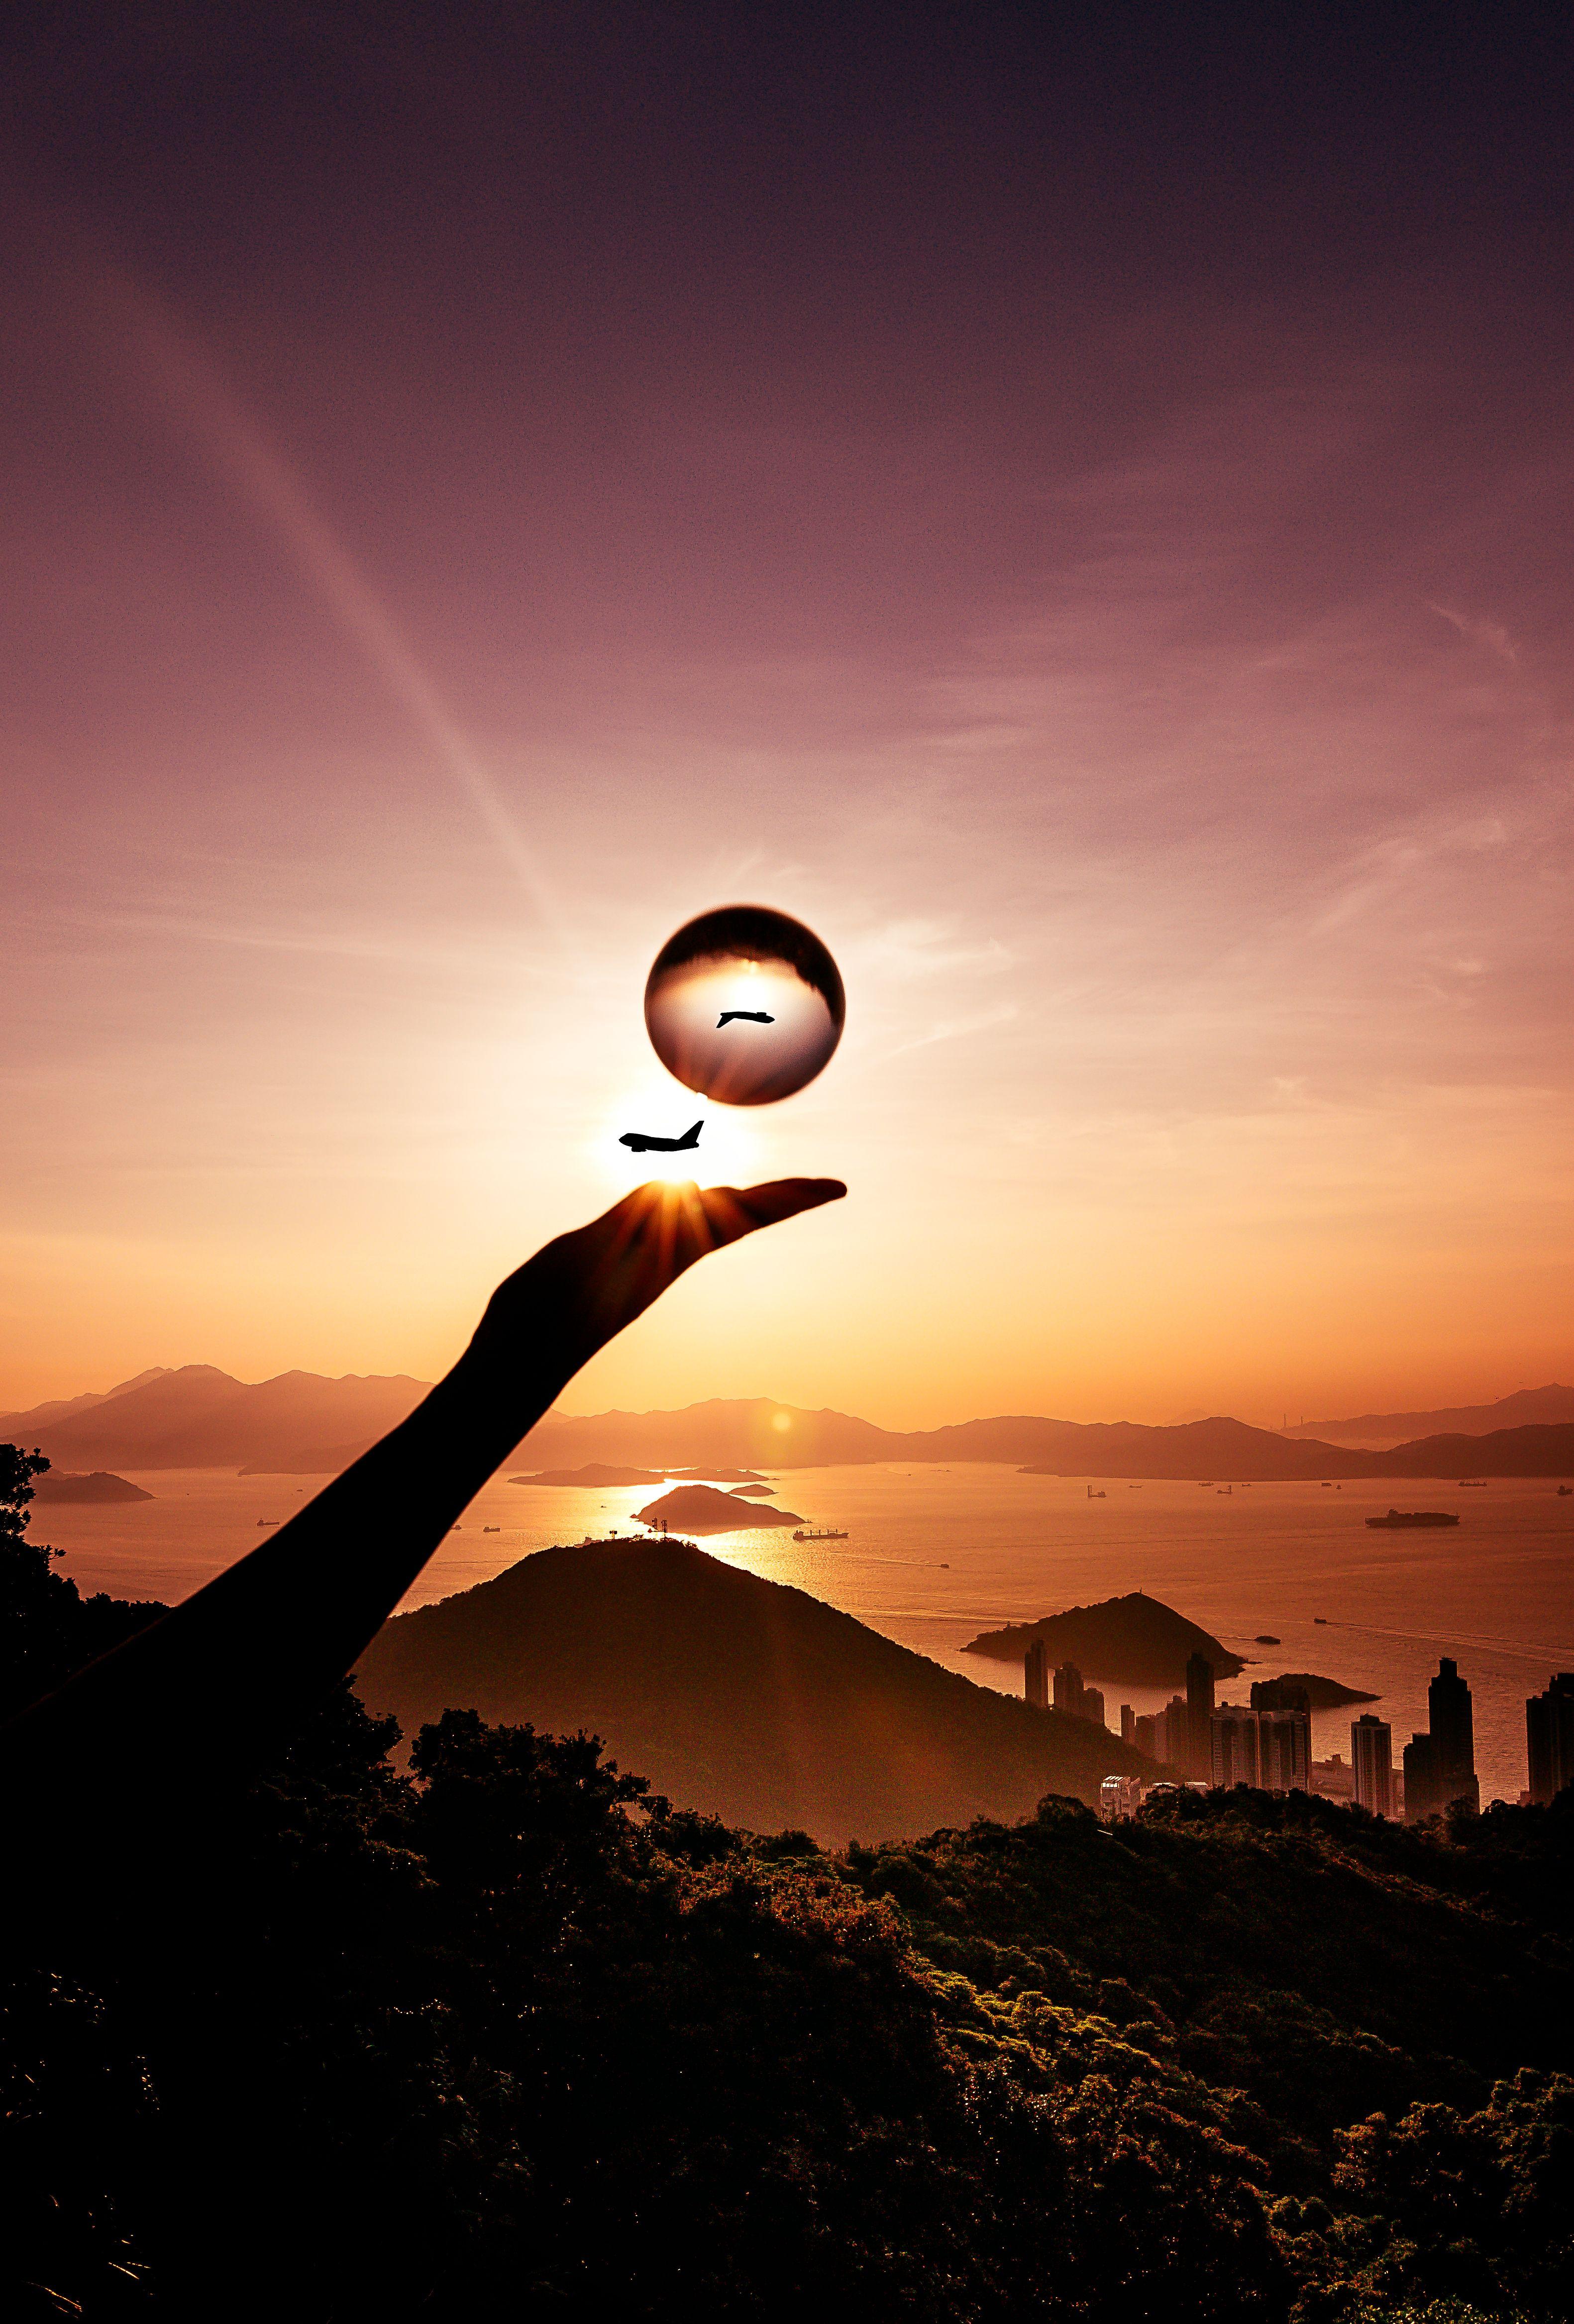 33 Sunset Photography Ideas Sunset Photography Photography Crystal Ball